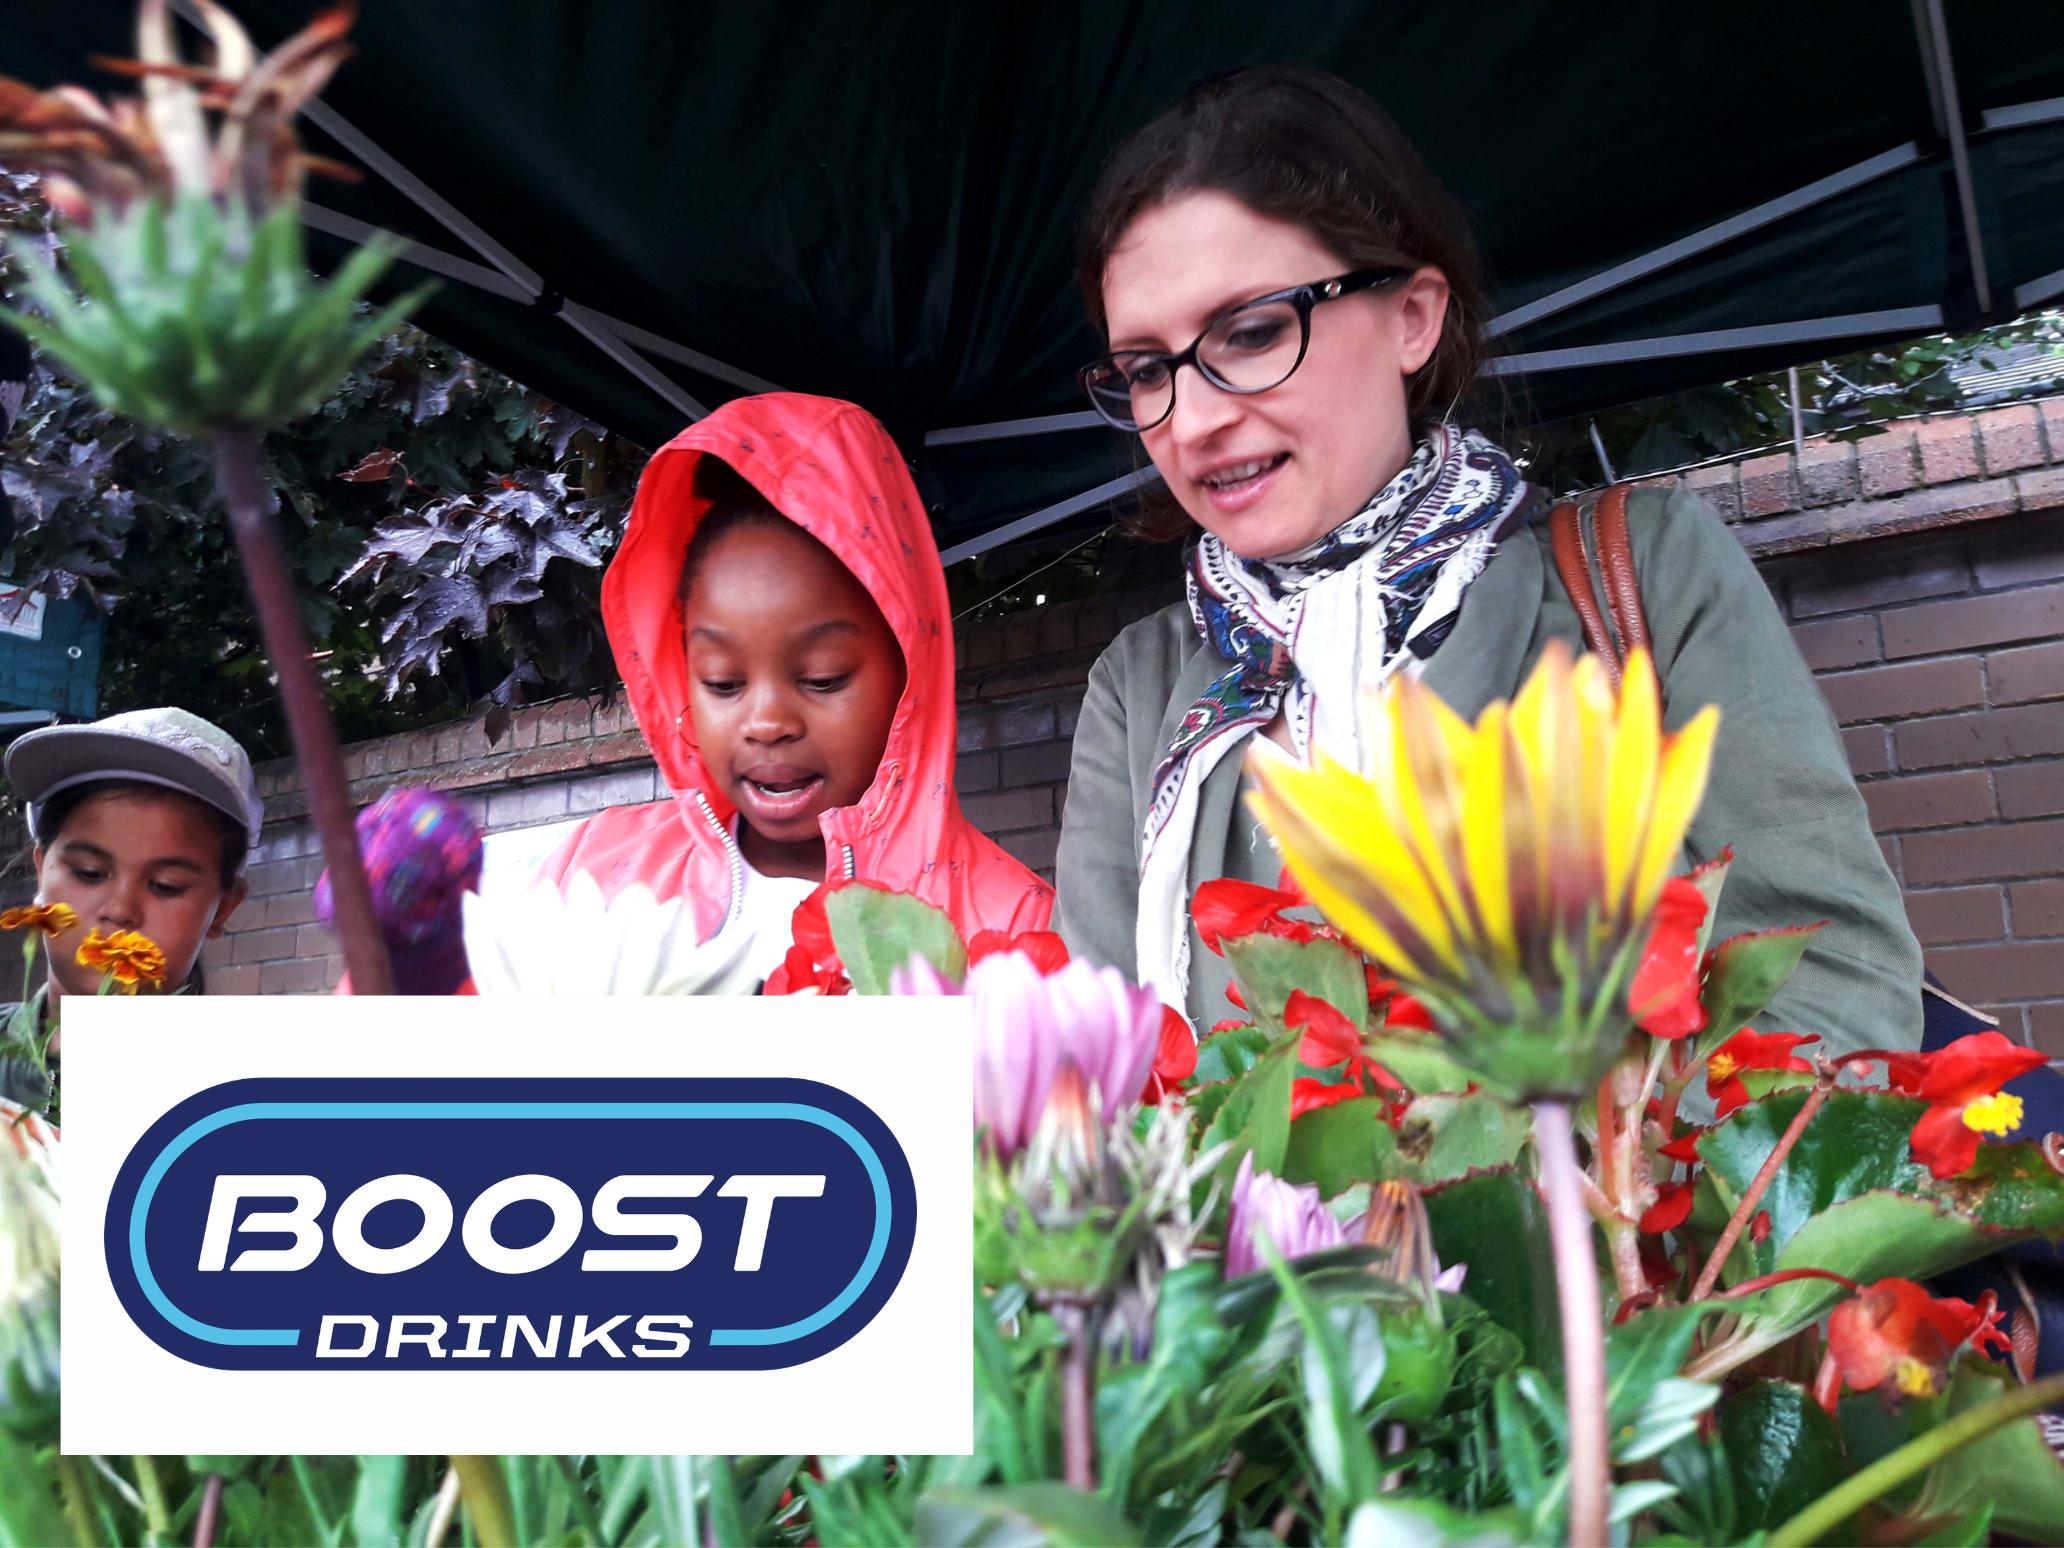 Boost - Choose Now, Change Lives